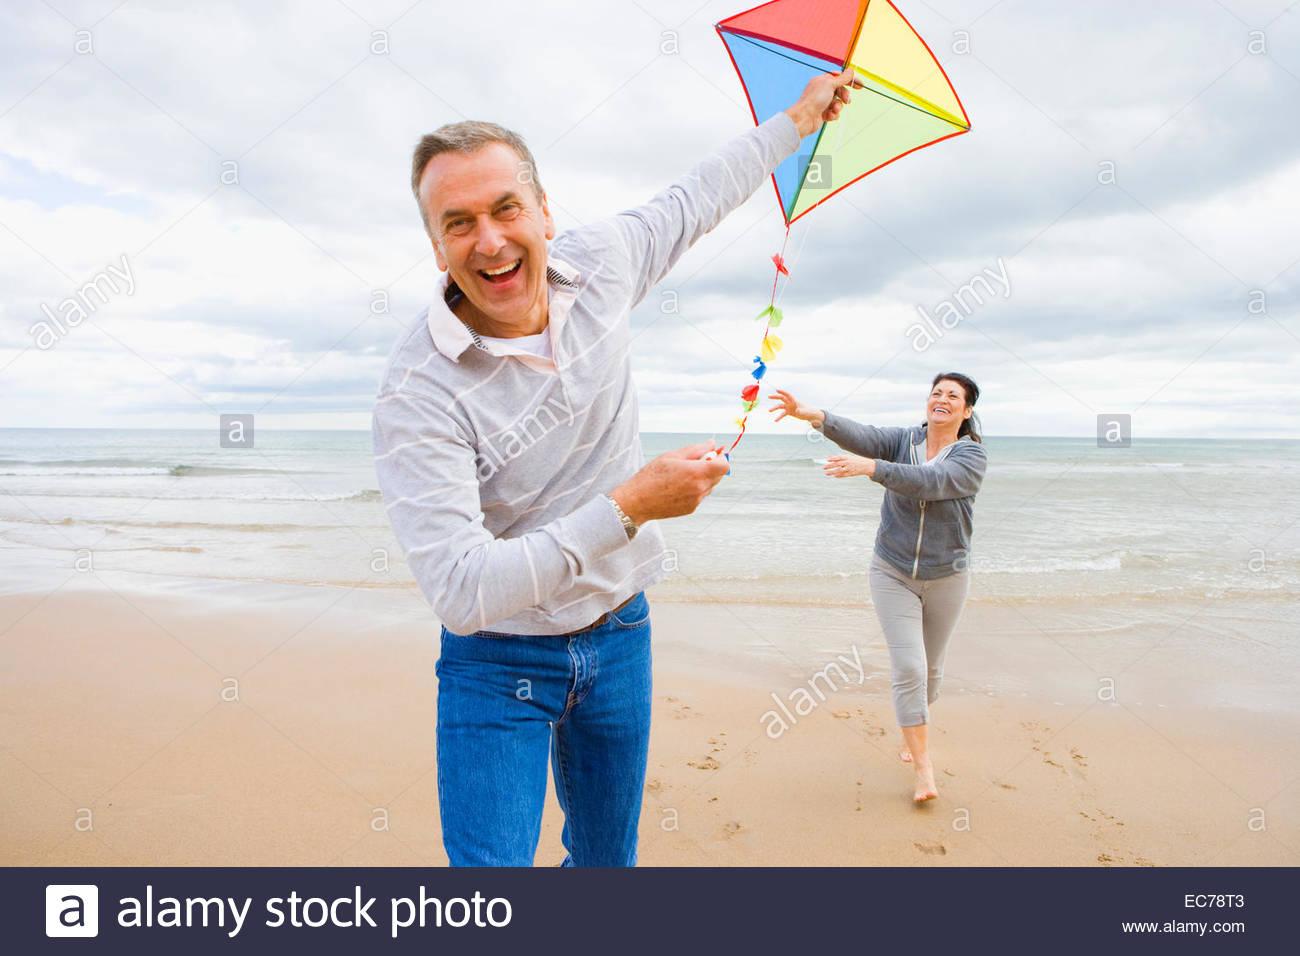 Older couple flying kite on beach - Stock Image